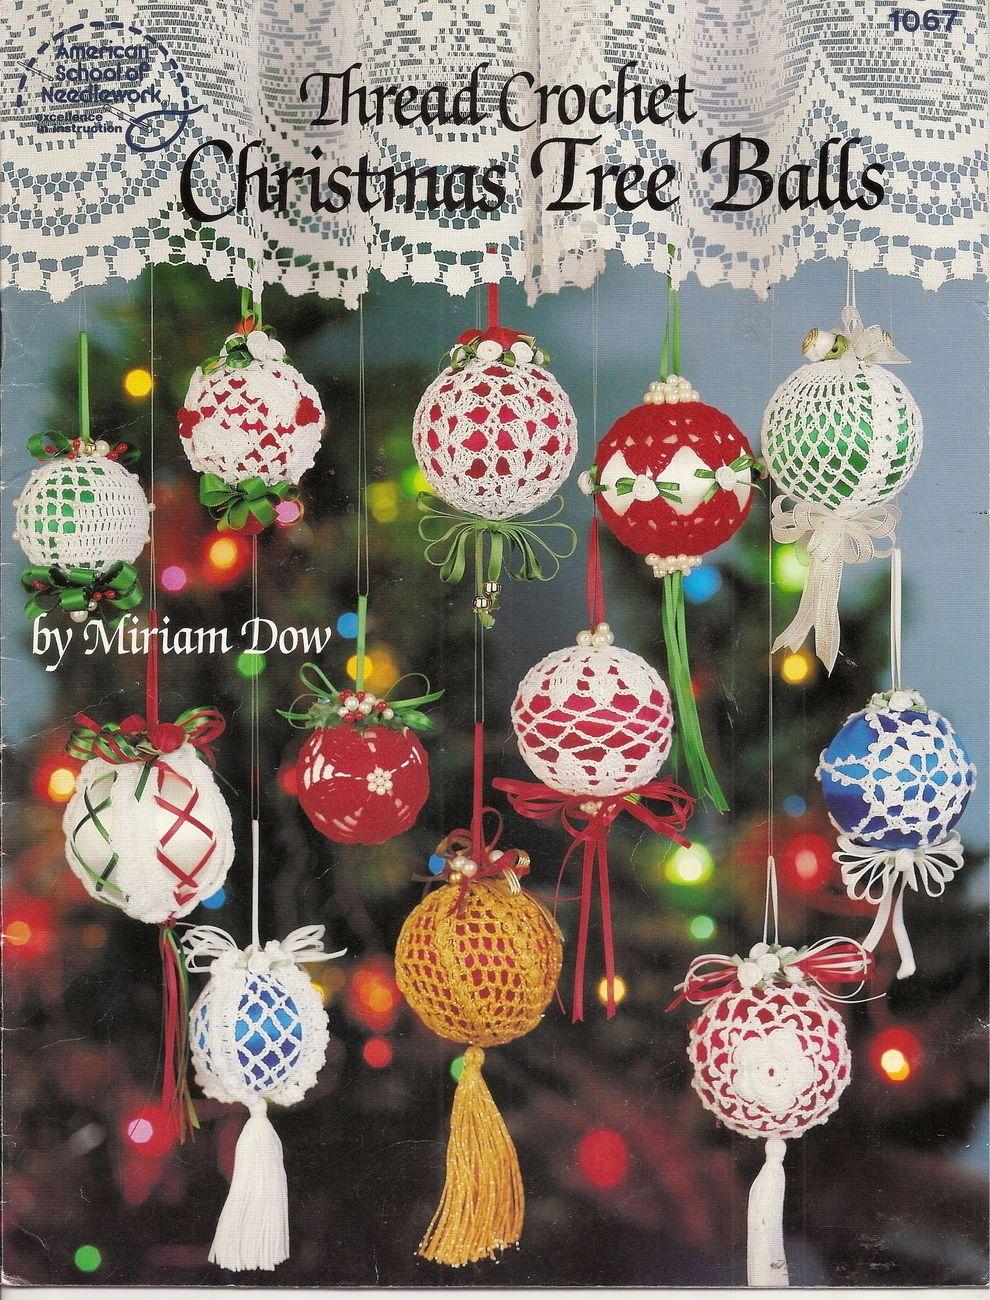 Thread Crochet Christmas Tree Balls American School Of Needlework 12 Patterns Holiday Crochet Christmas Crochet Christmas Ornament Pattern